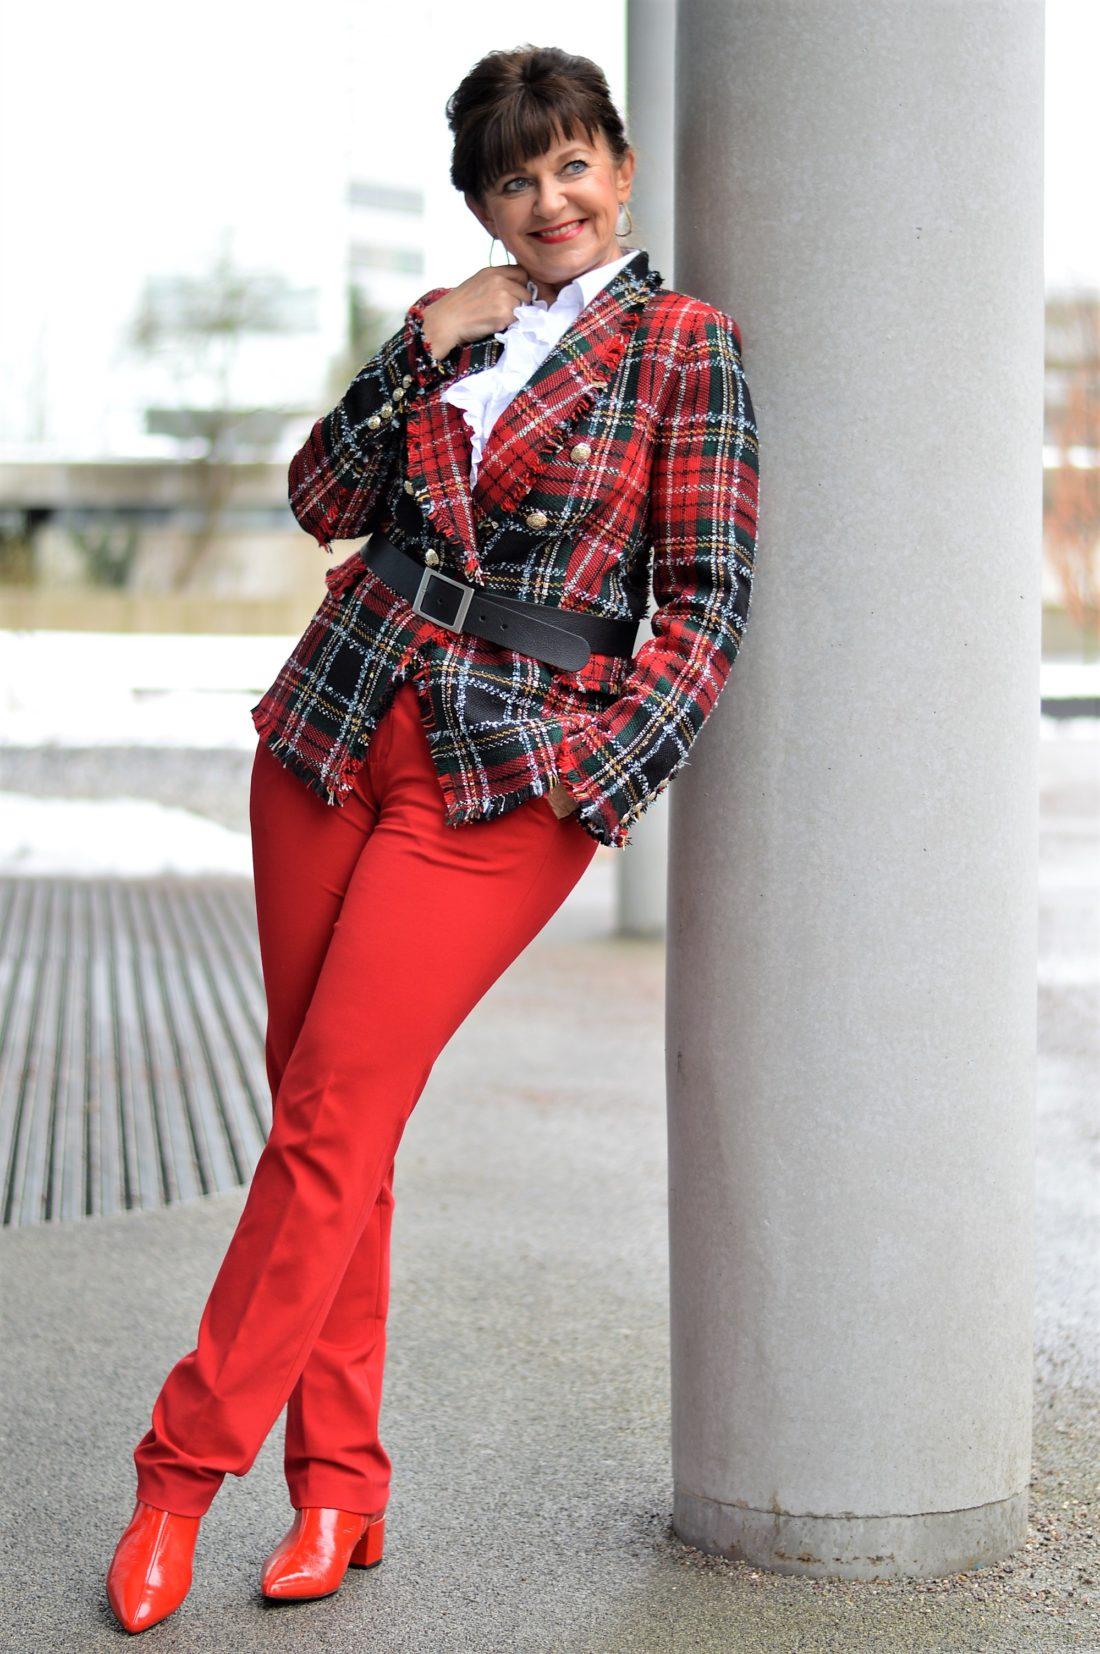 Martina Berg Lady 50plus Fashion Lifestyle Blog Für Frauen 50plus